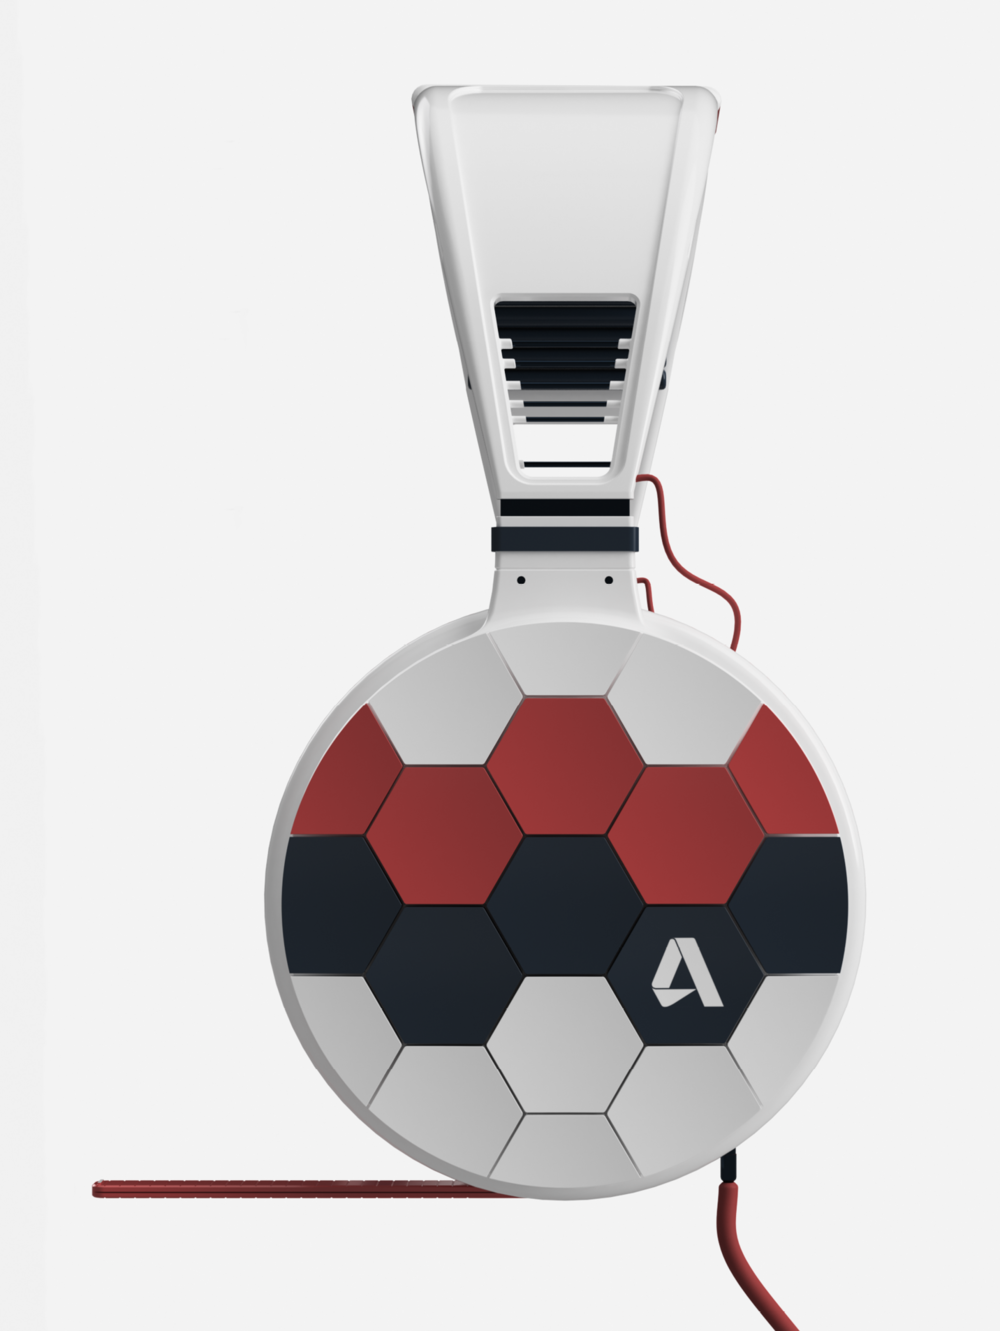 AndrewEdge_DesignForAudio.png